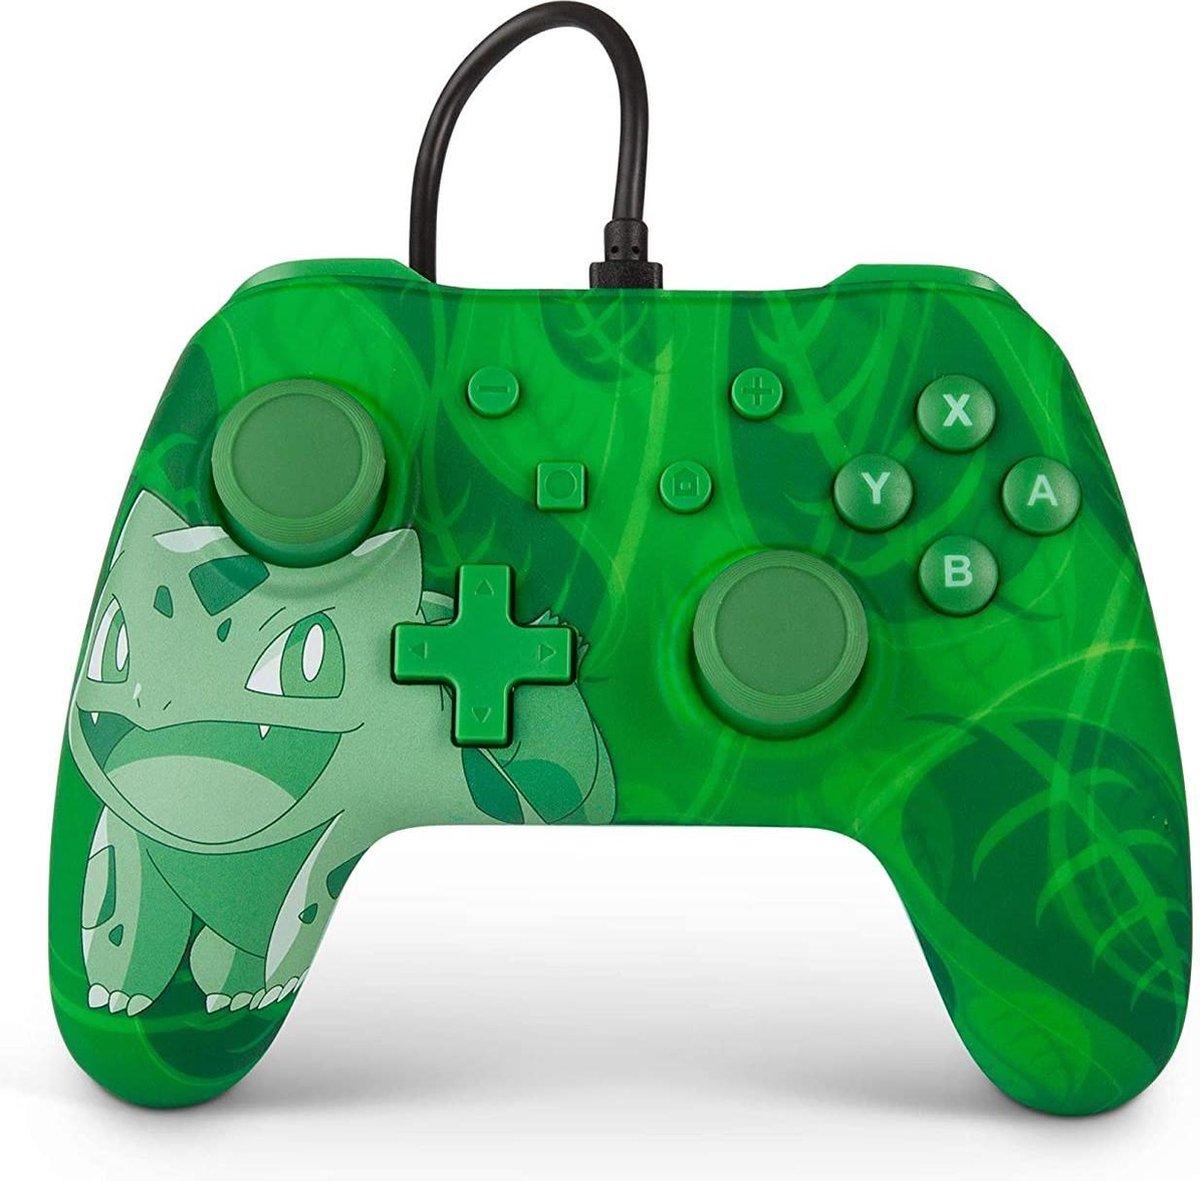 PowerA Nintendo Switch controller Switch pro controller Pokemon groen.